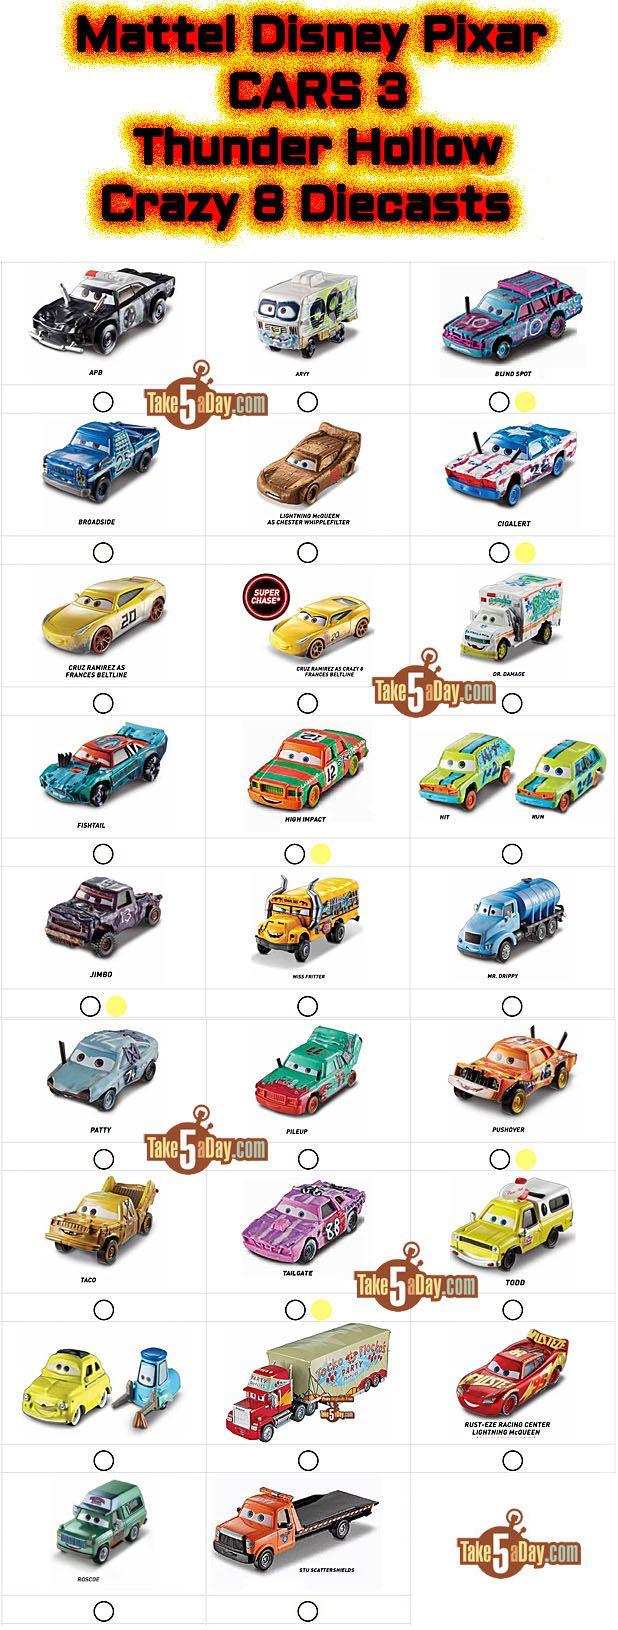 Mattel Disney Pixar Cars 3 Thunder Hollow Crazy 8 Derby Diecasts